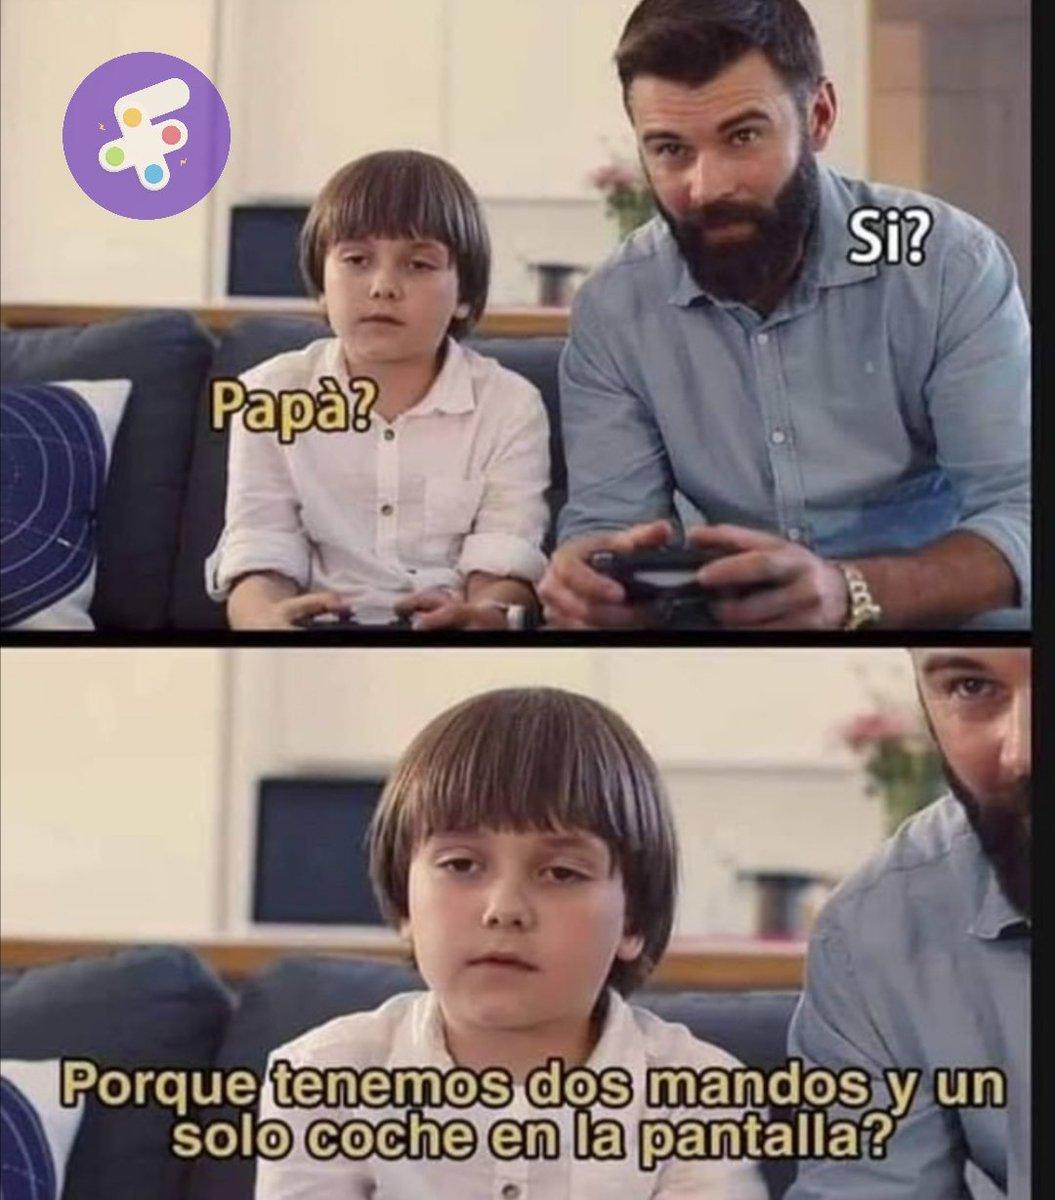 Ellos lo saben!  . . . . #memeschilenos #memesvideojuegos #gamermeme #memesgamer #frikeros #frikers #chilegamers #gamerchile #gamerschilenos #gamingchilepic.twitter.com/Met8aqdsbe